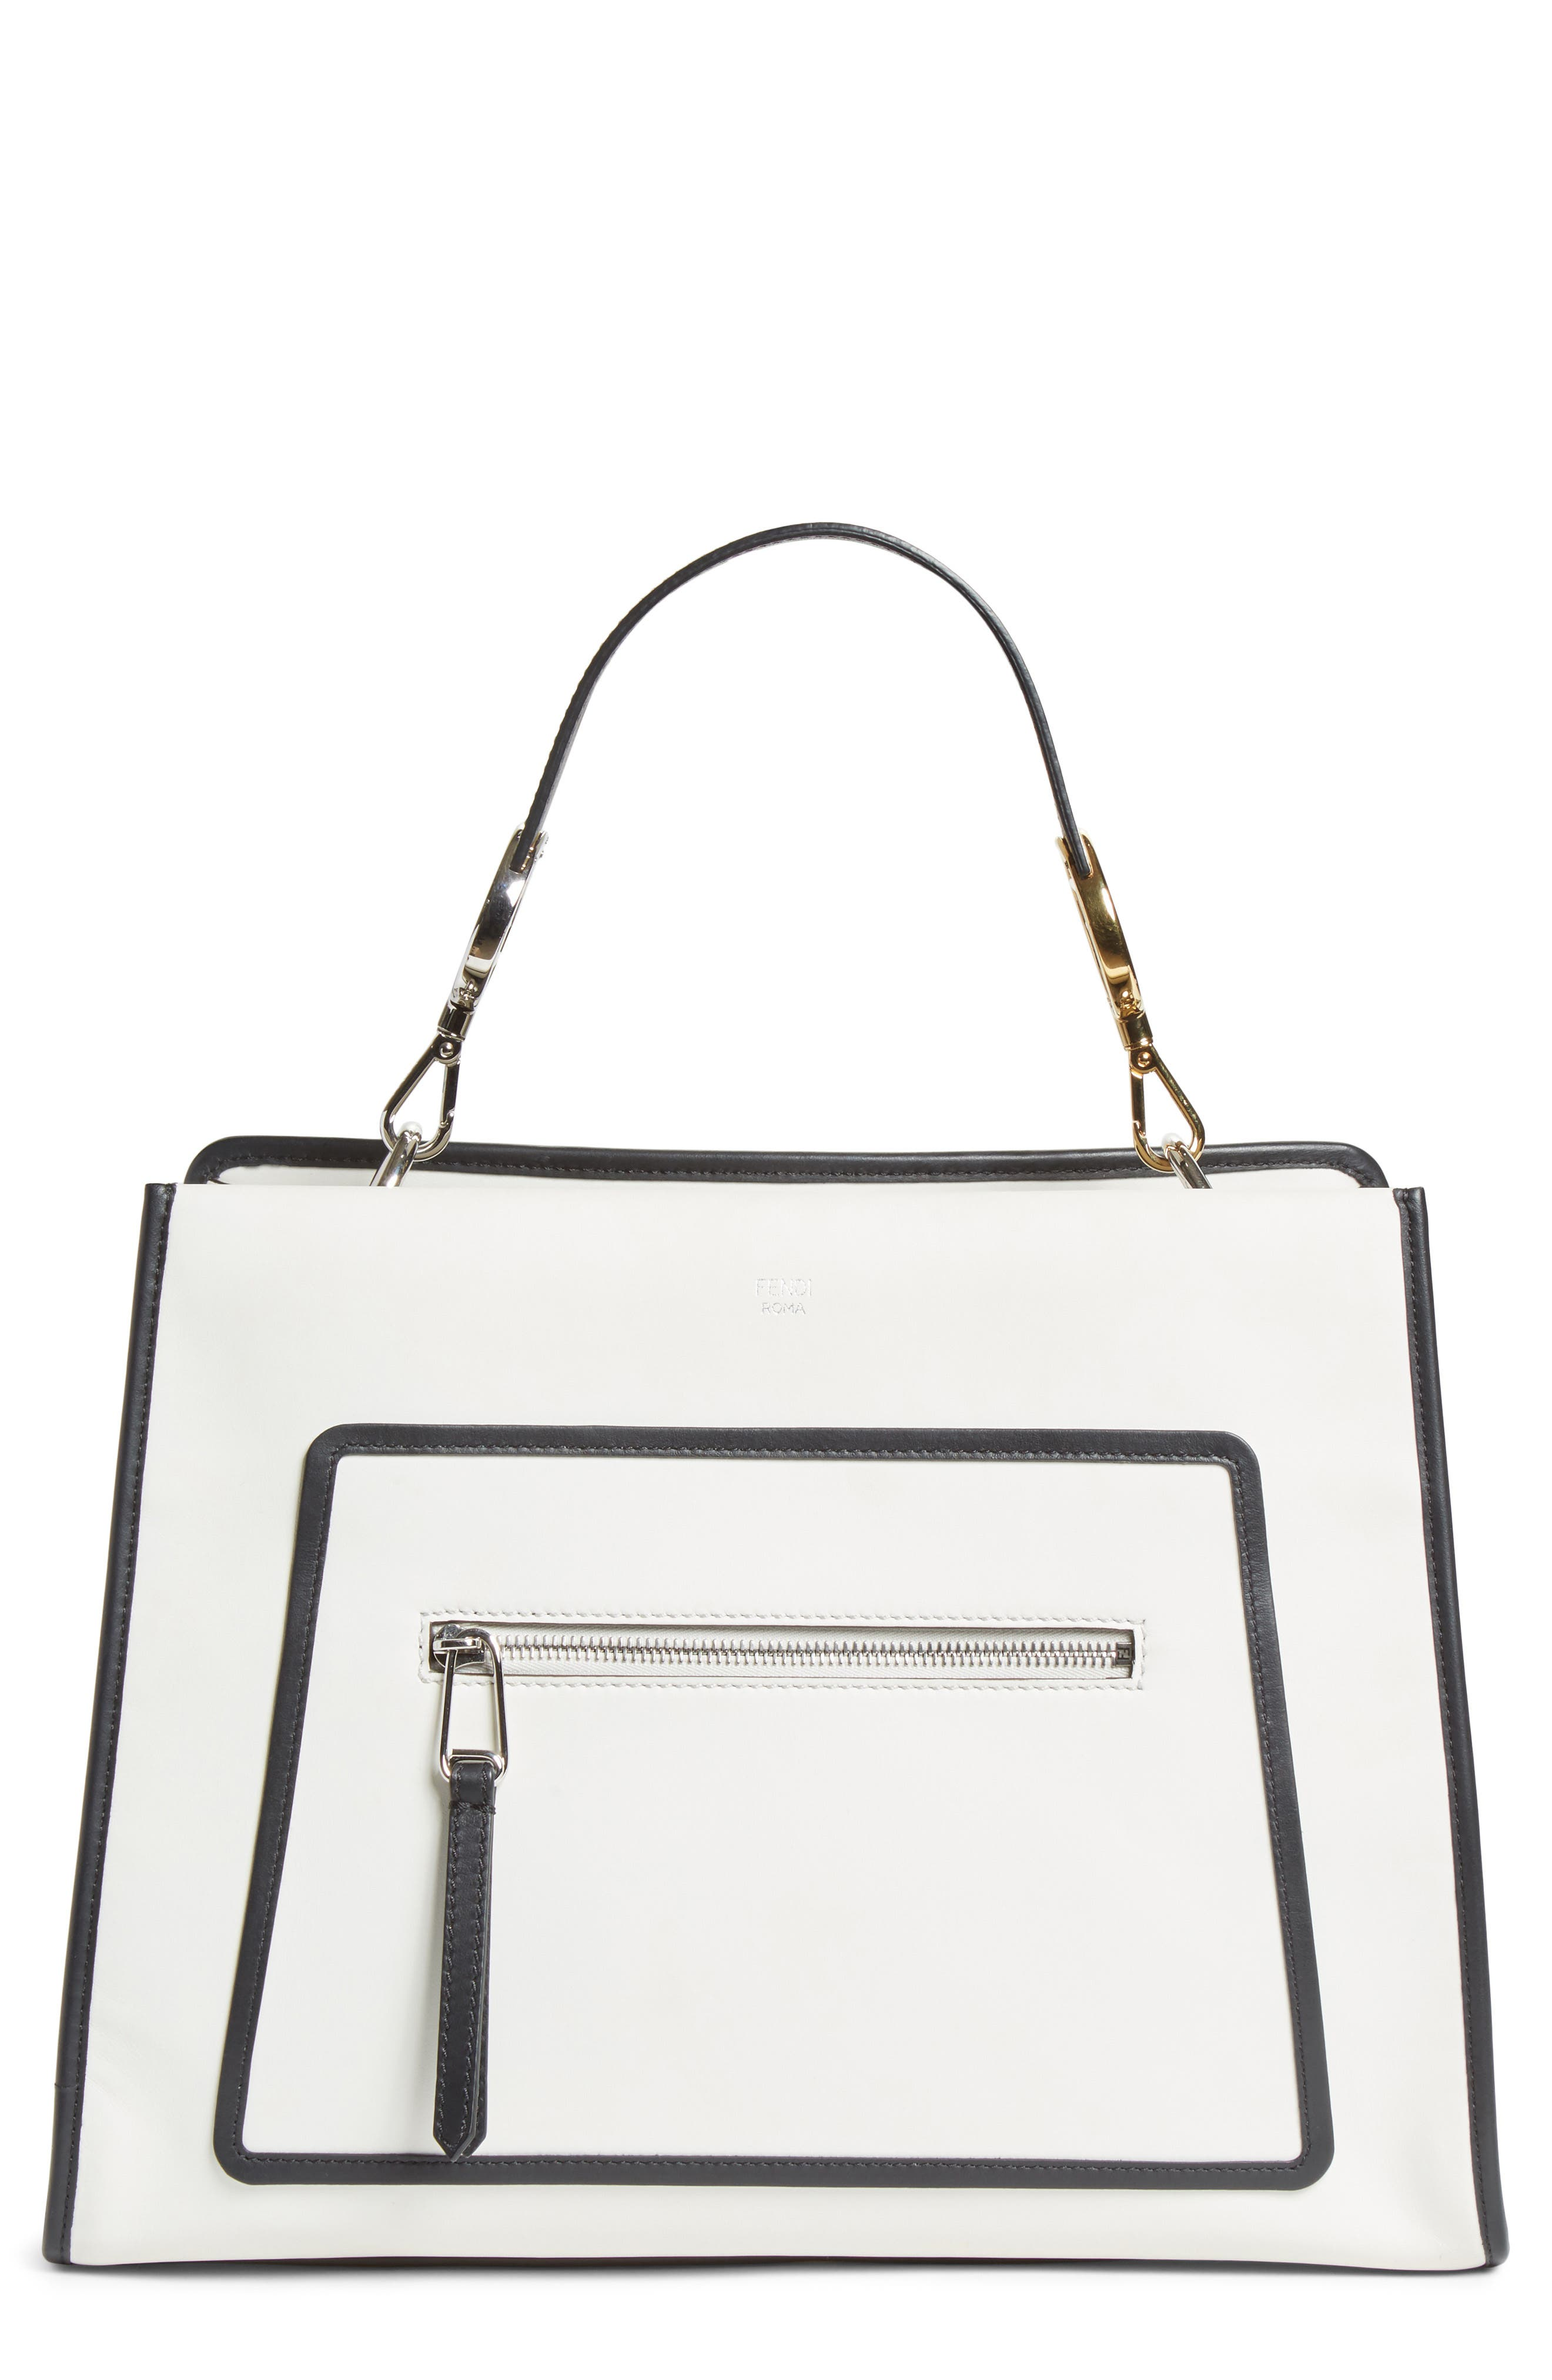 Fendi Runaway Medium Leather Tote Bag